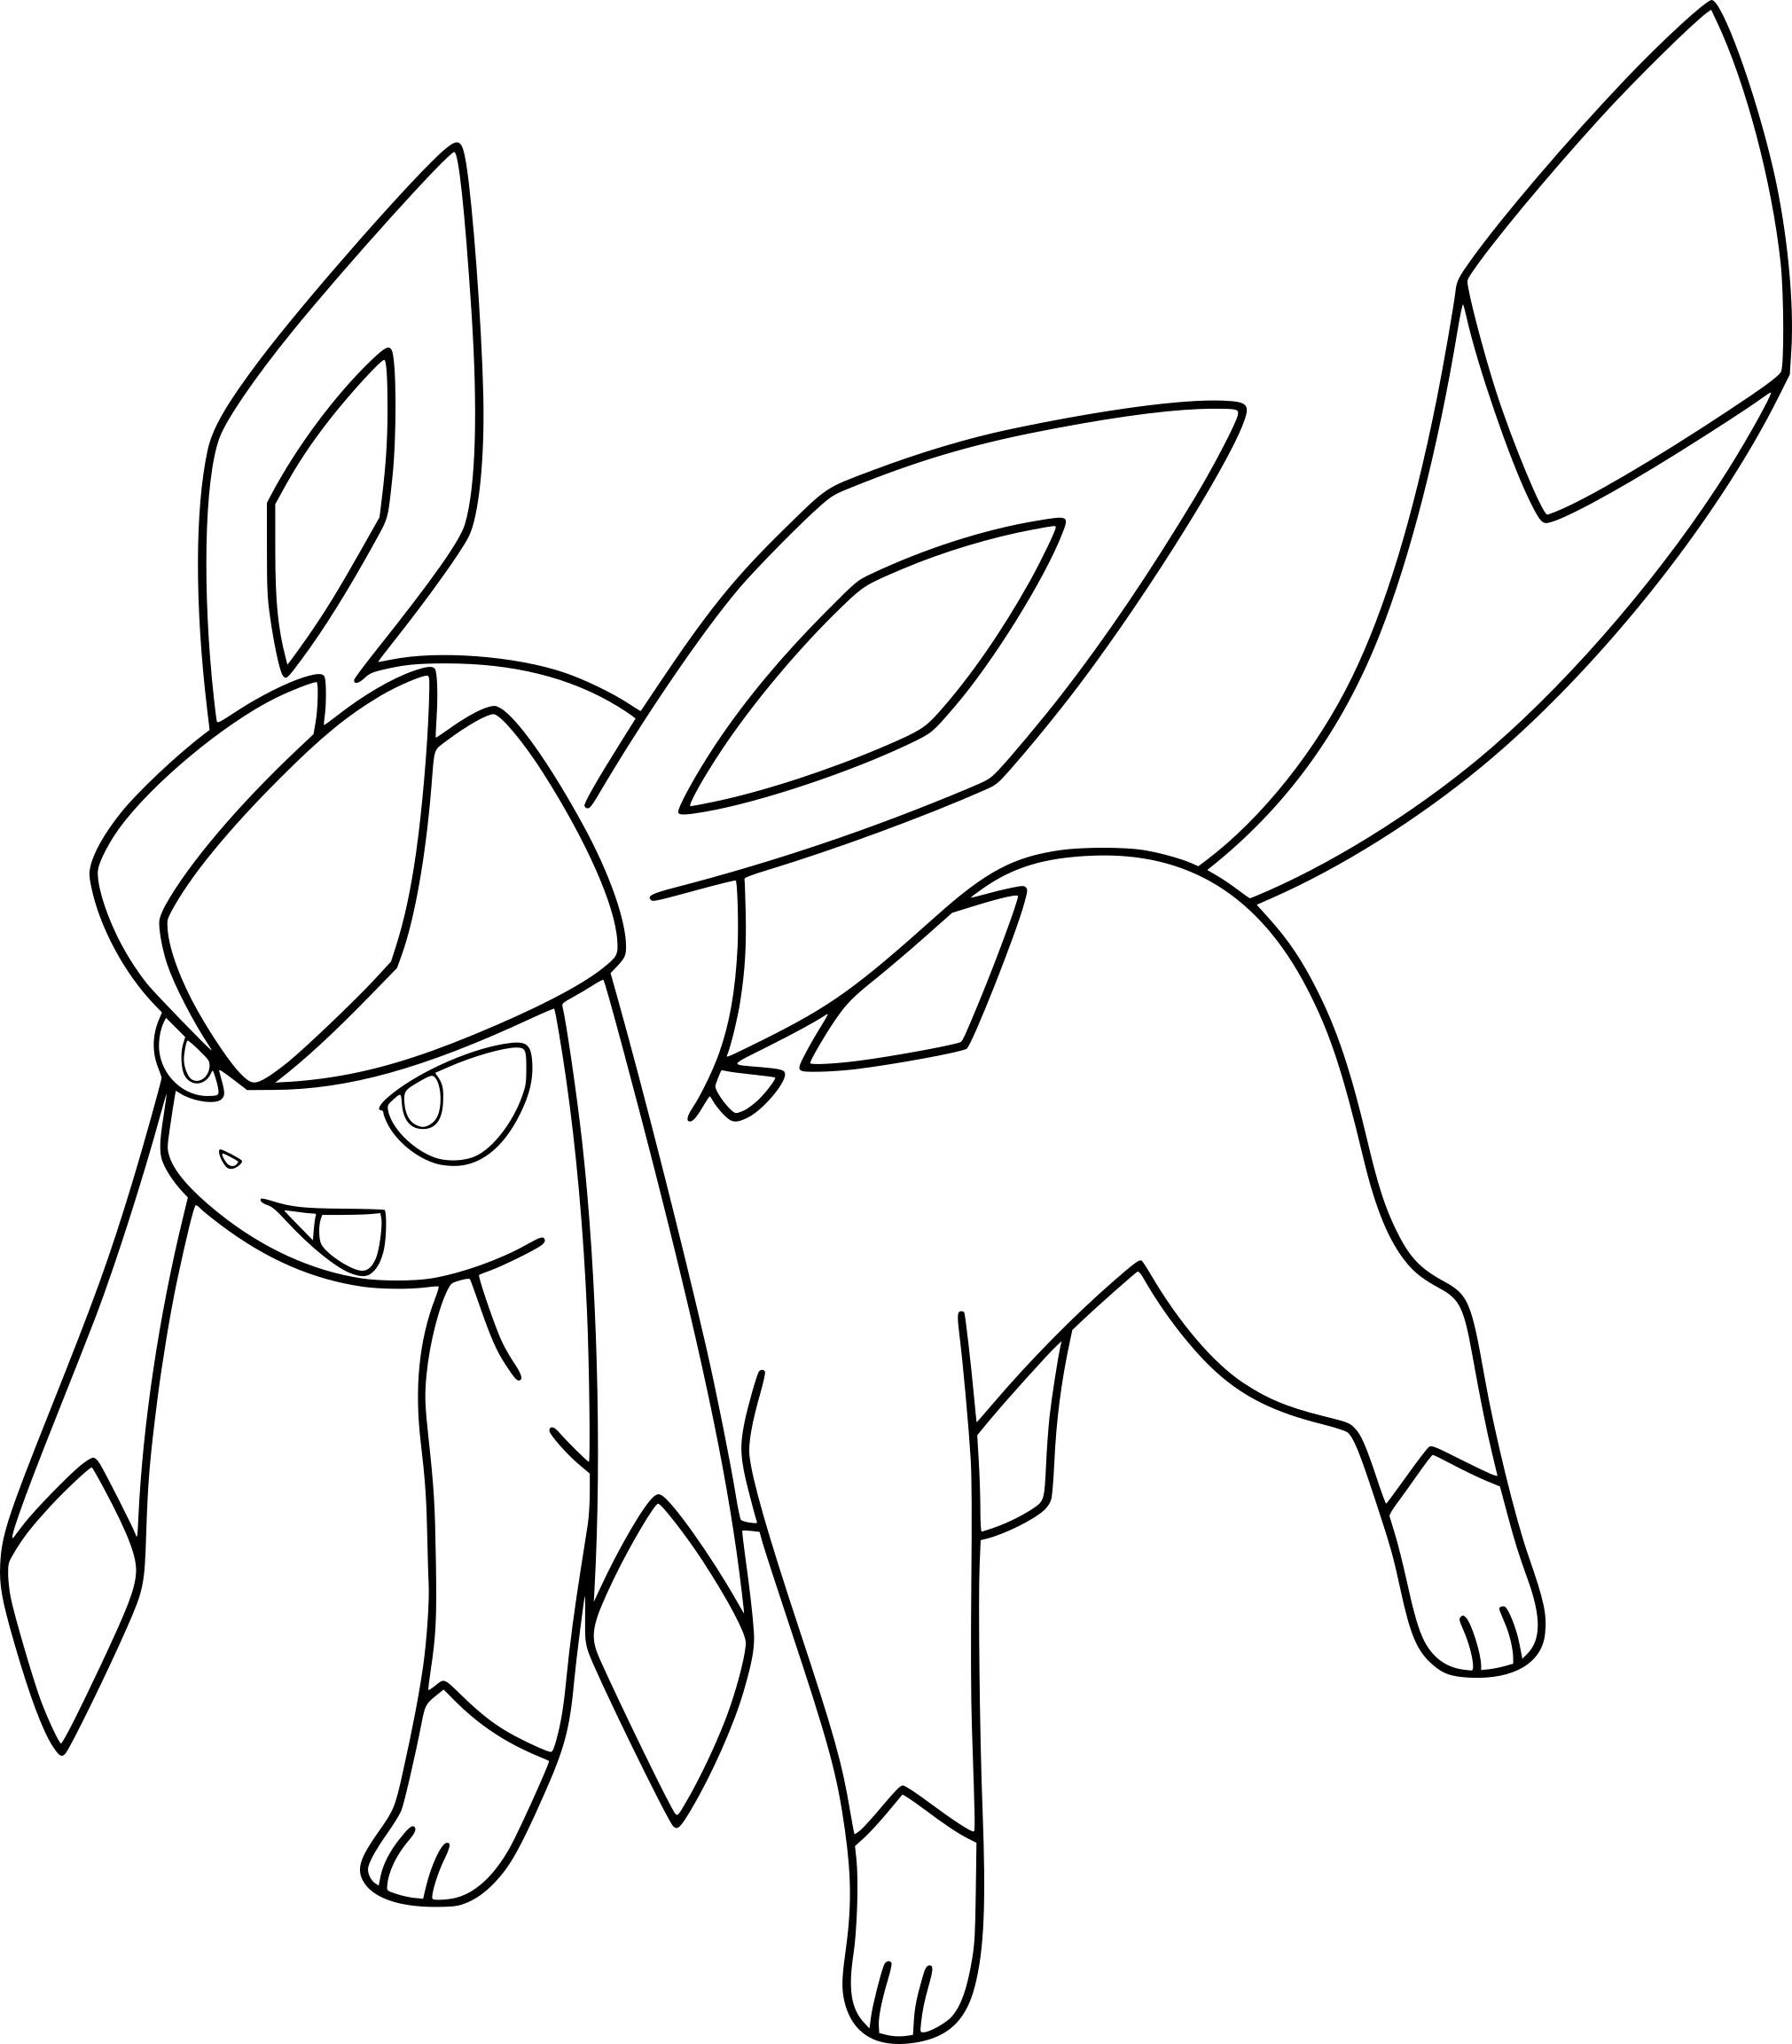 Coloriage Givrali Pokemon à imprimer